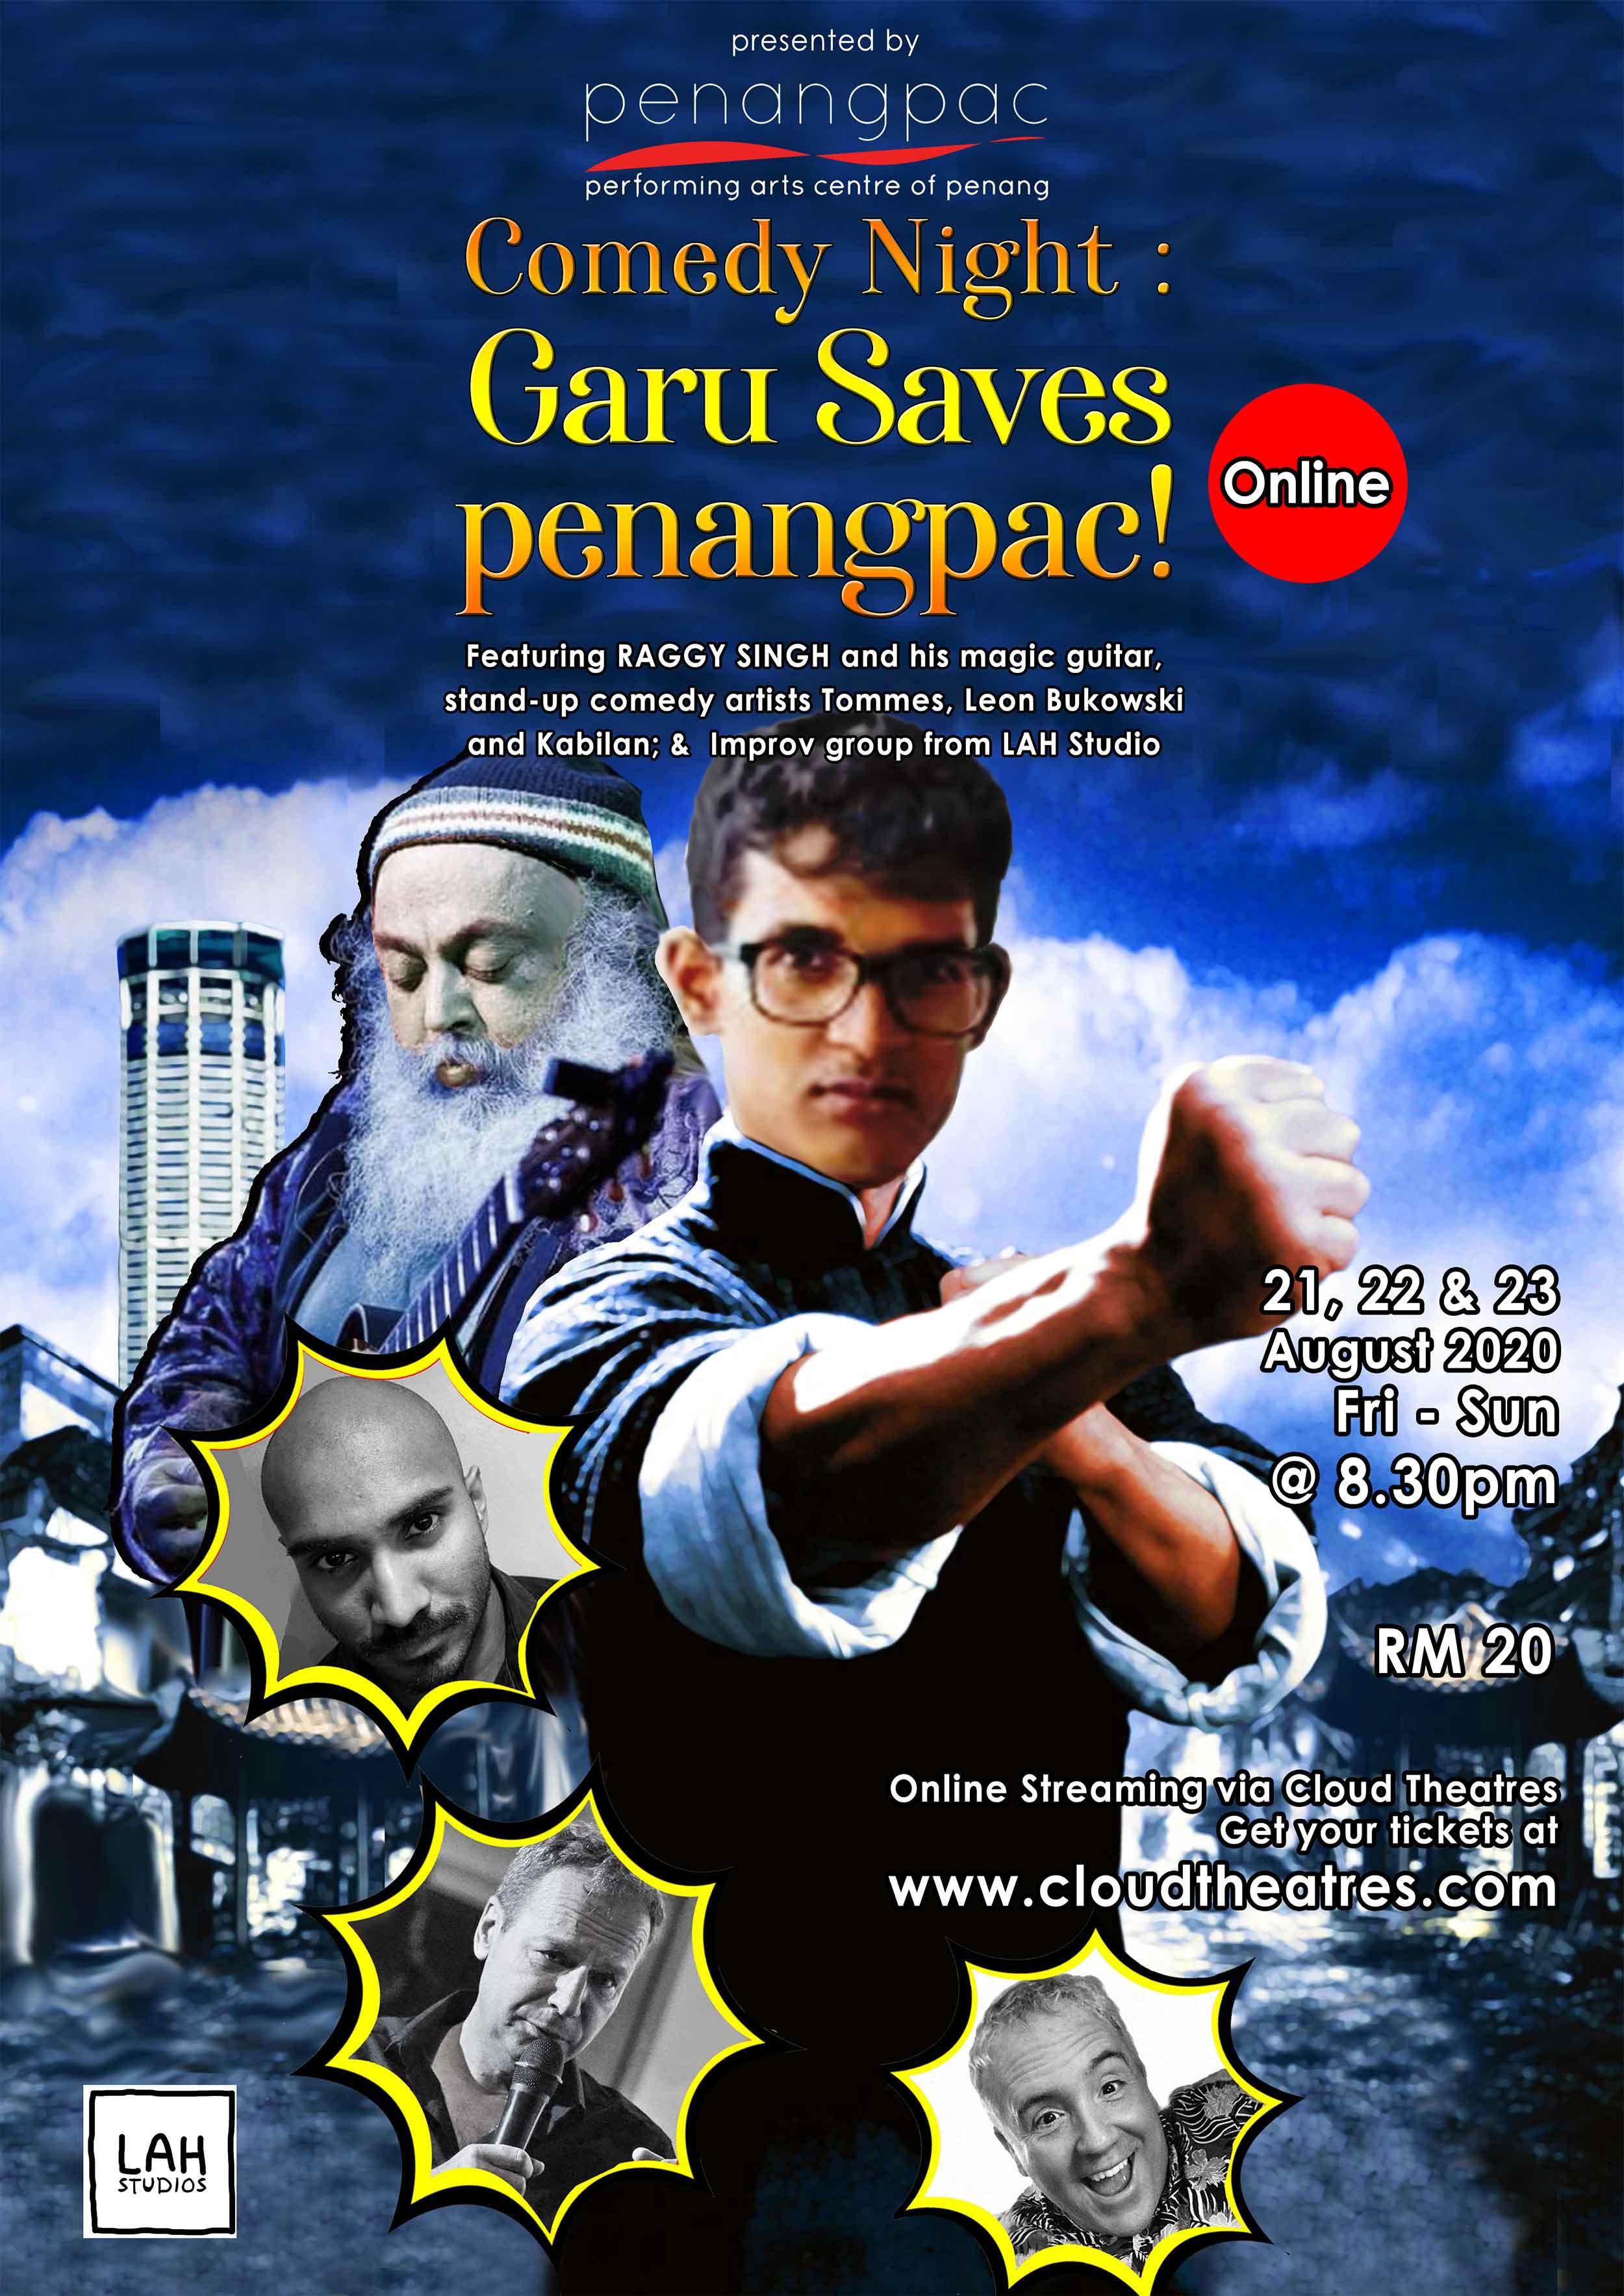 Comedy Night : Garu Saves penangpac! 賈魯拯救檳城表演藝術中心